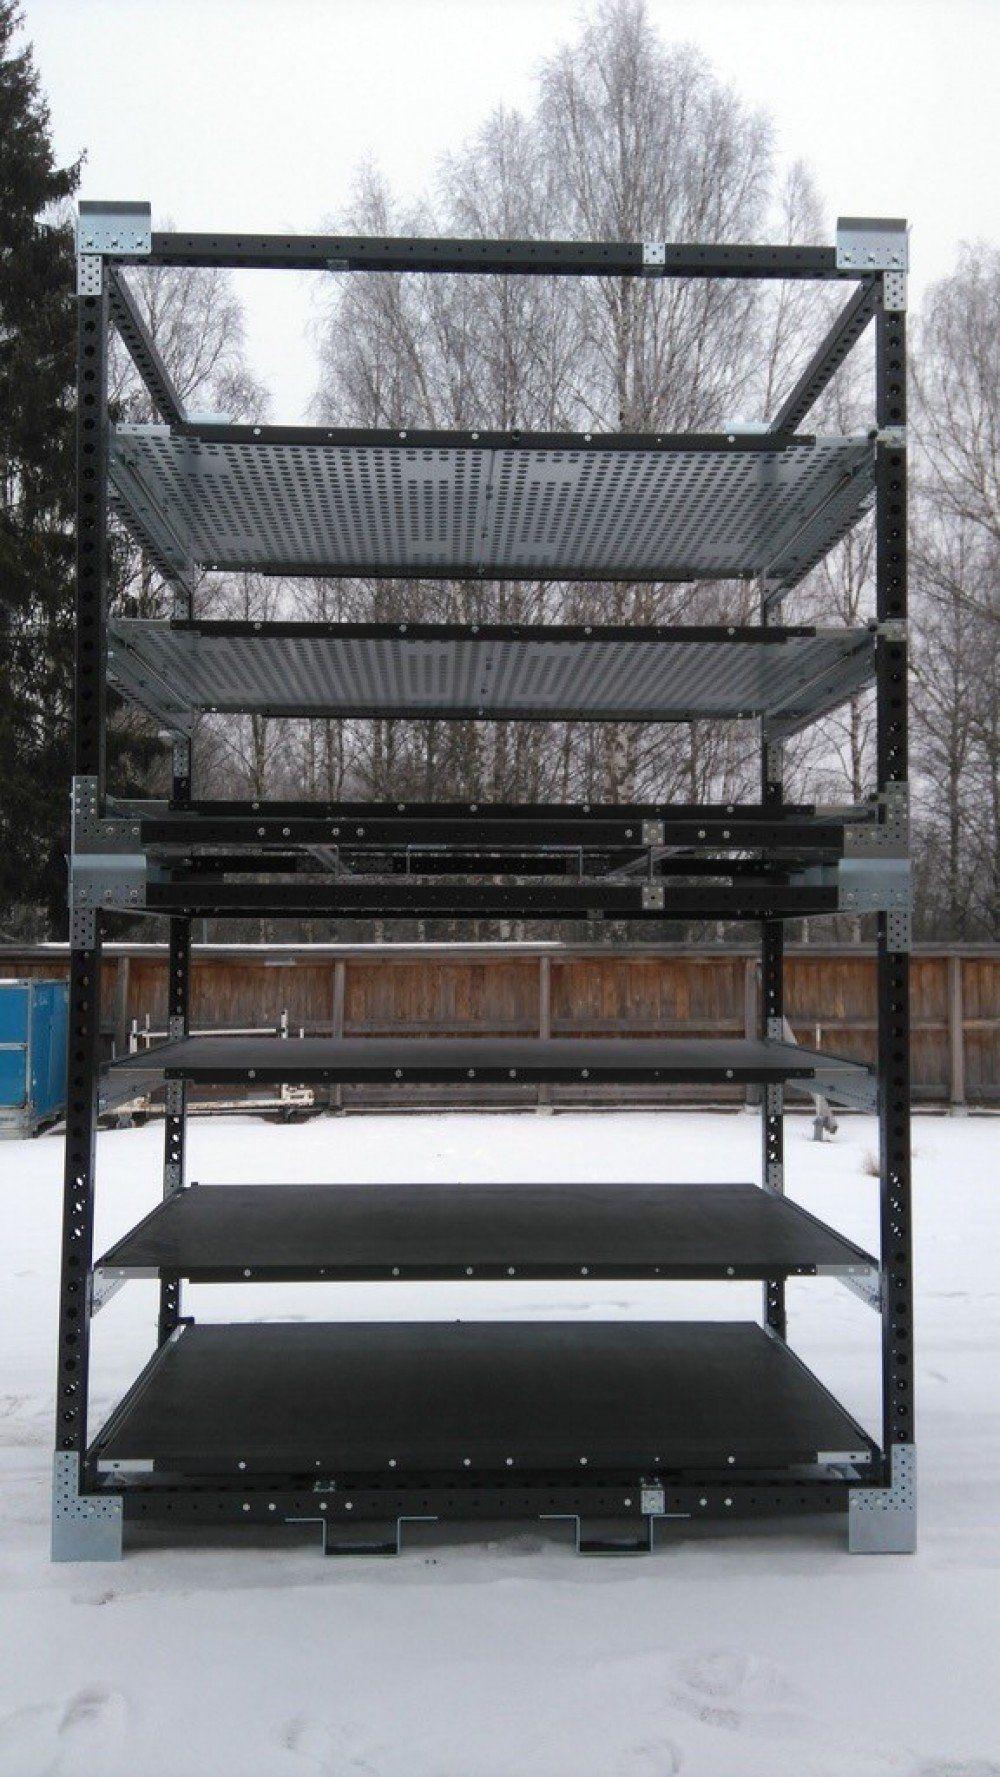 FlexQube racks stacked in snow